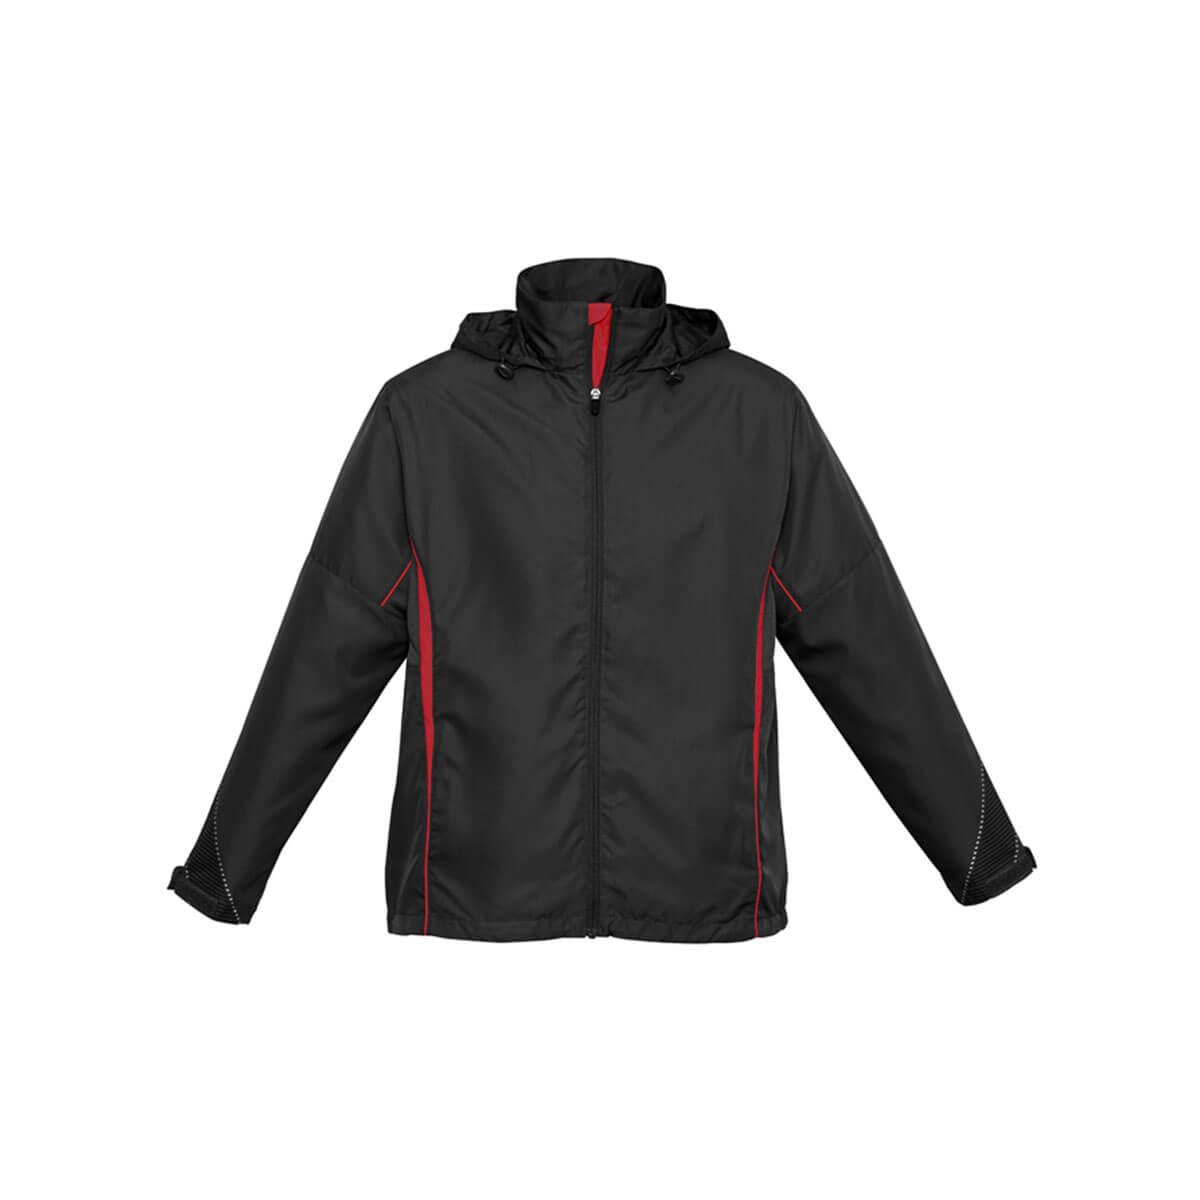 Adults Razor Team Jacket-Black / Red